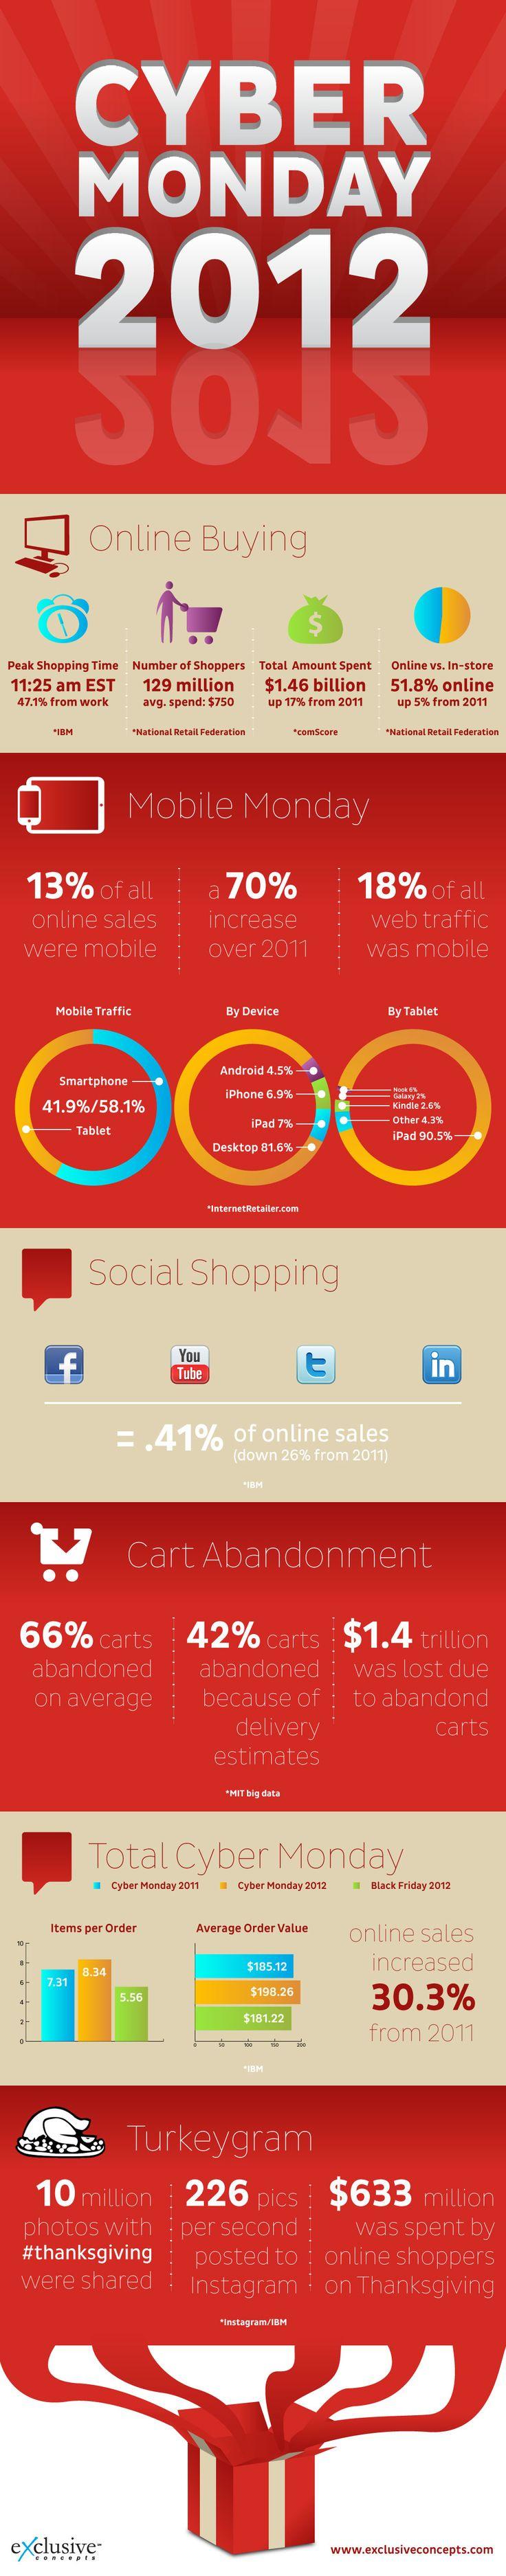 2012 Cyber Monday statistics infographic